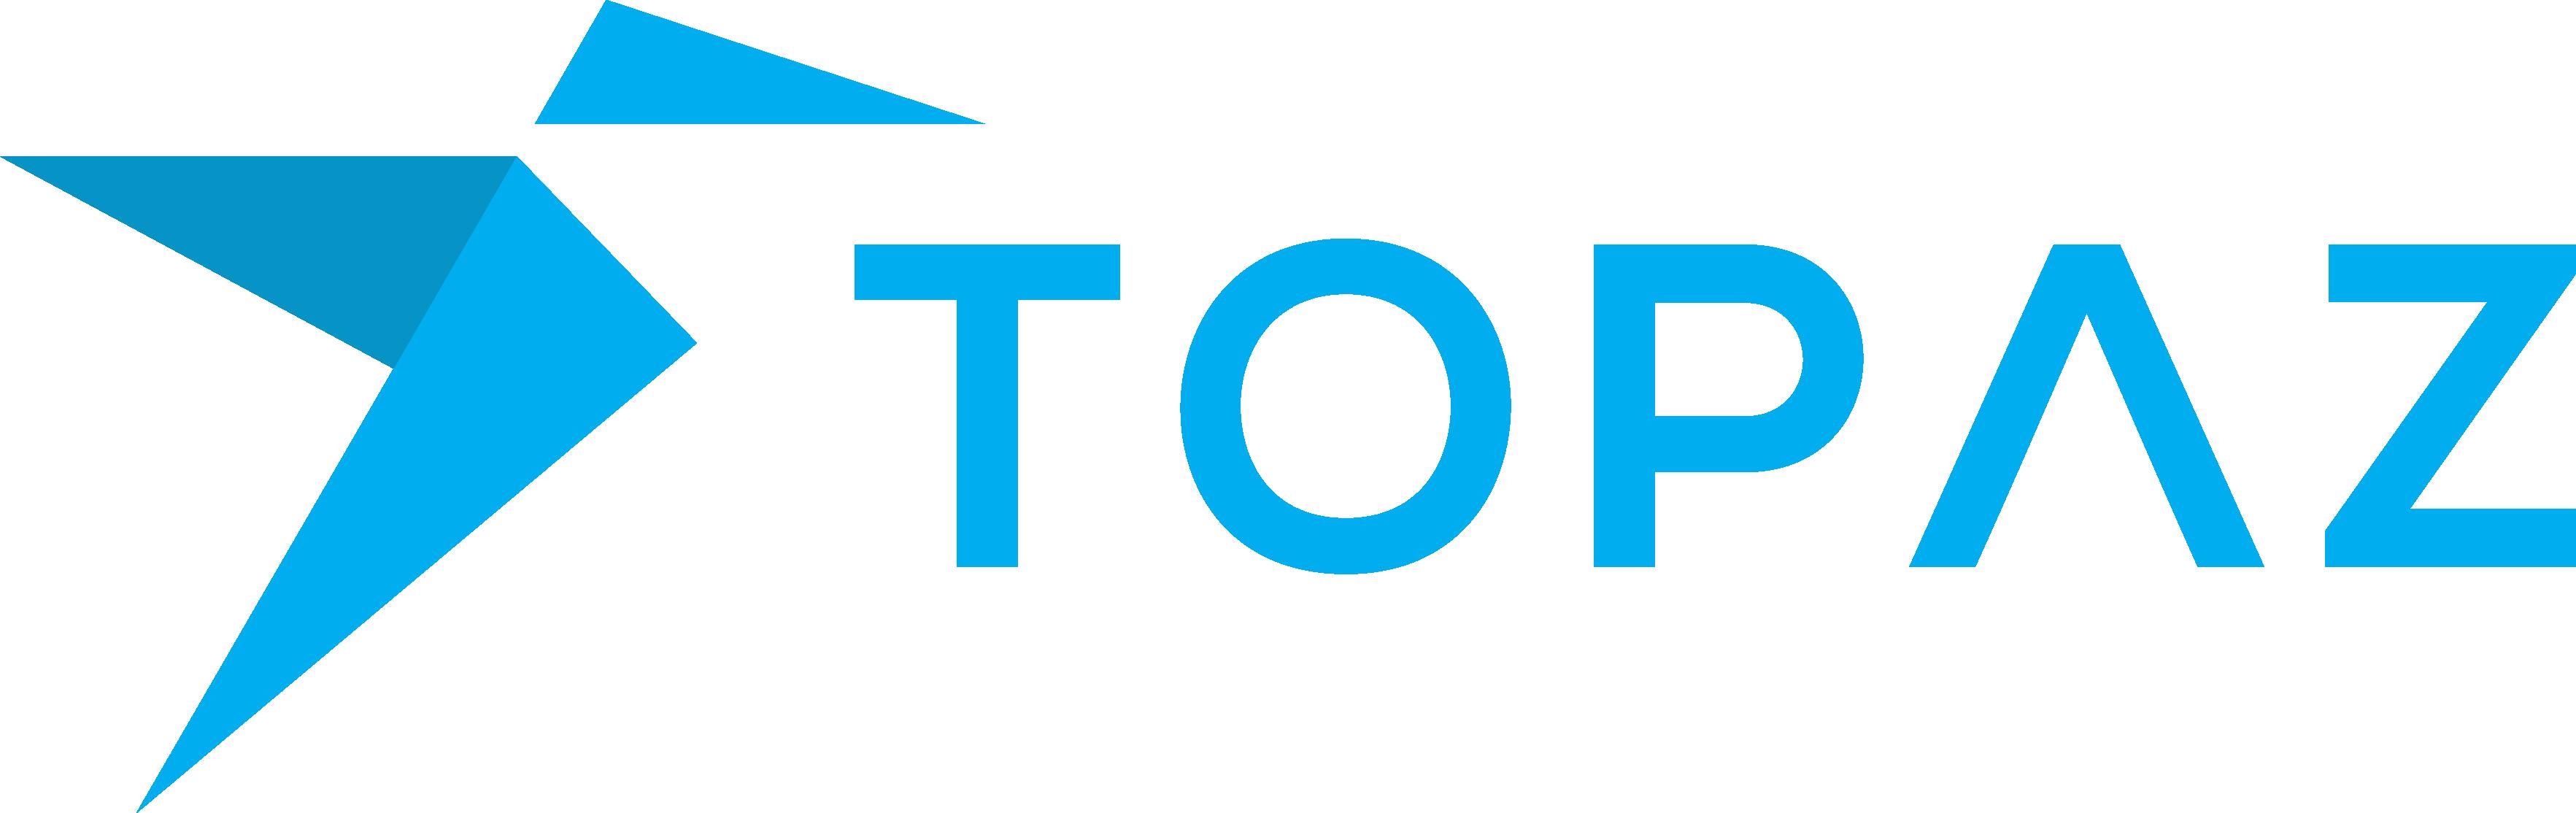 likeable logo for an innovative cloud service